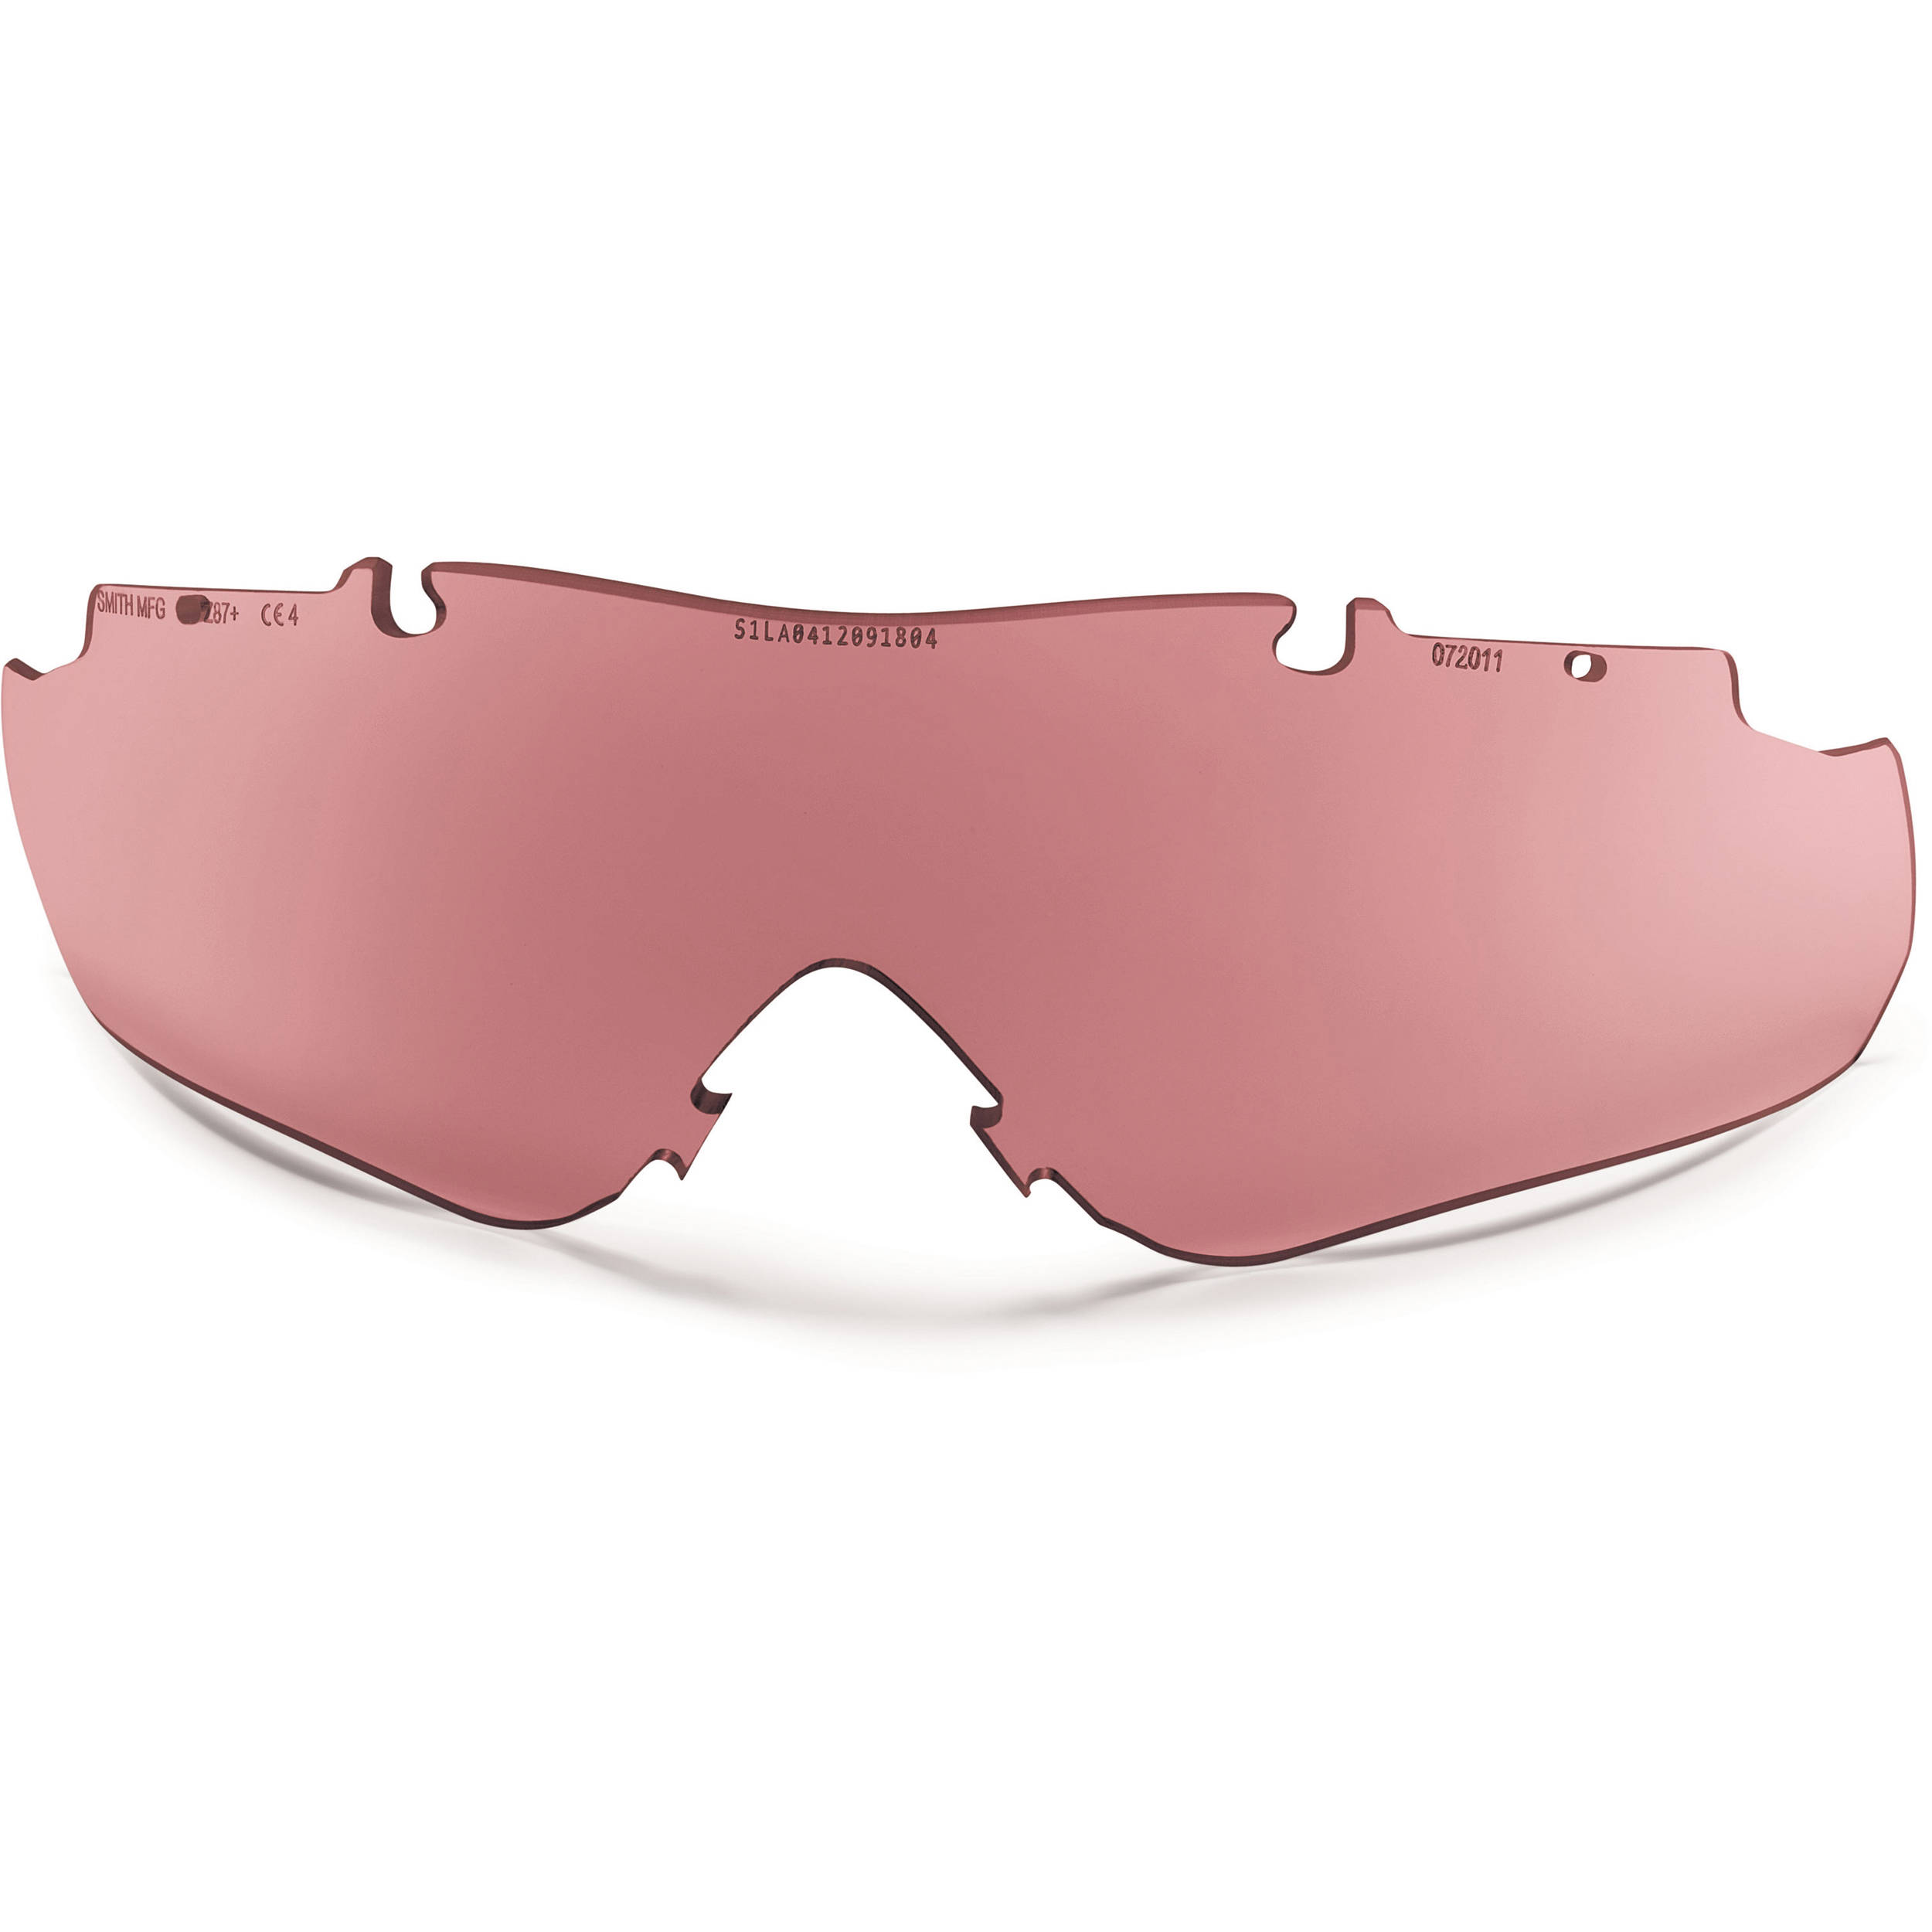 Smith Goggles Replacement Lenses : Smith optics aegis arc echo replacement lenses aeglnsiga b h